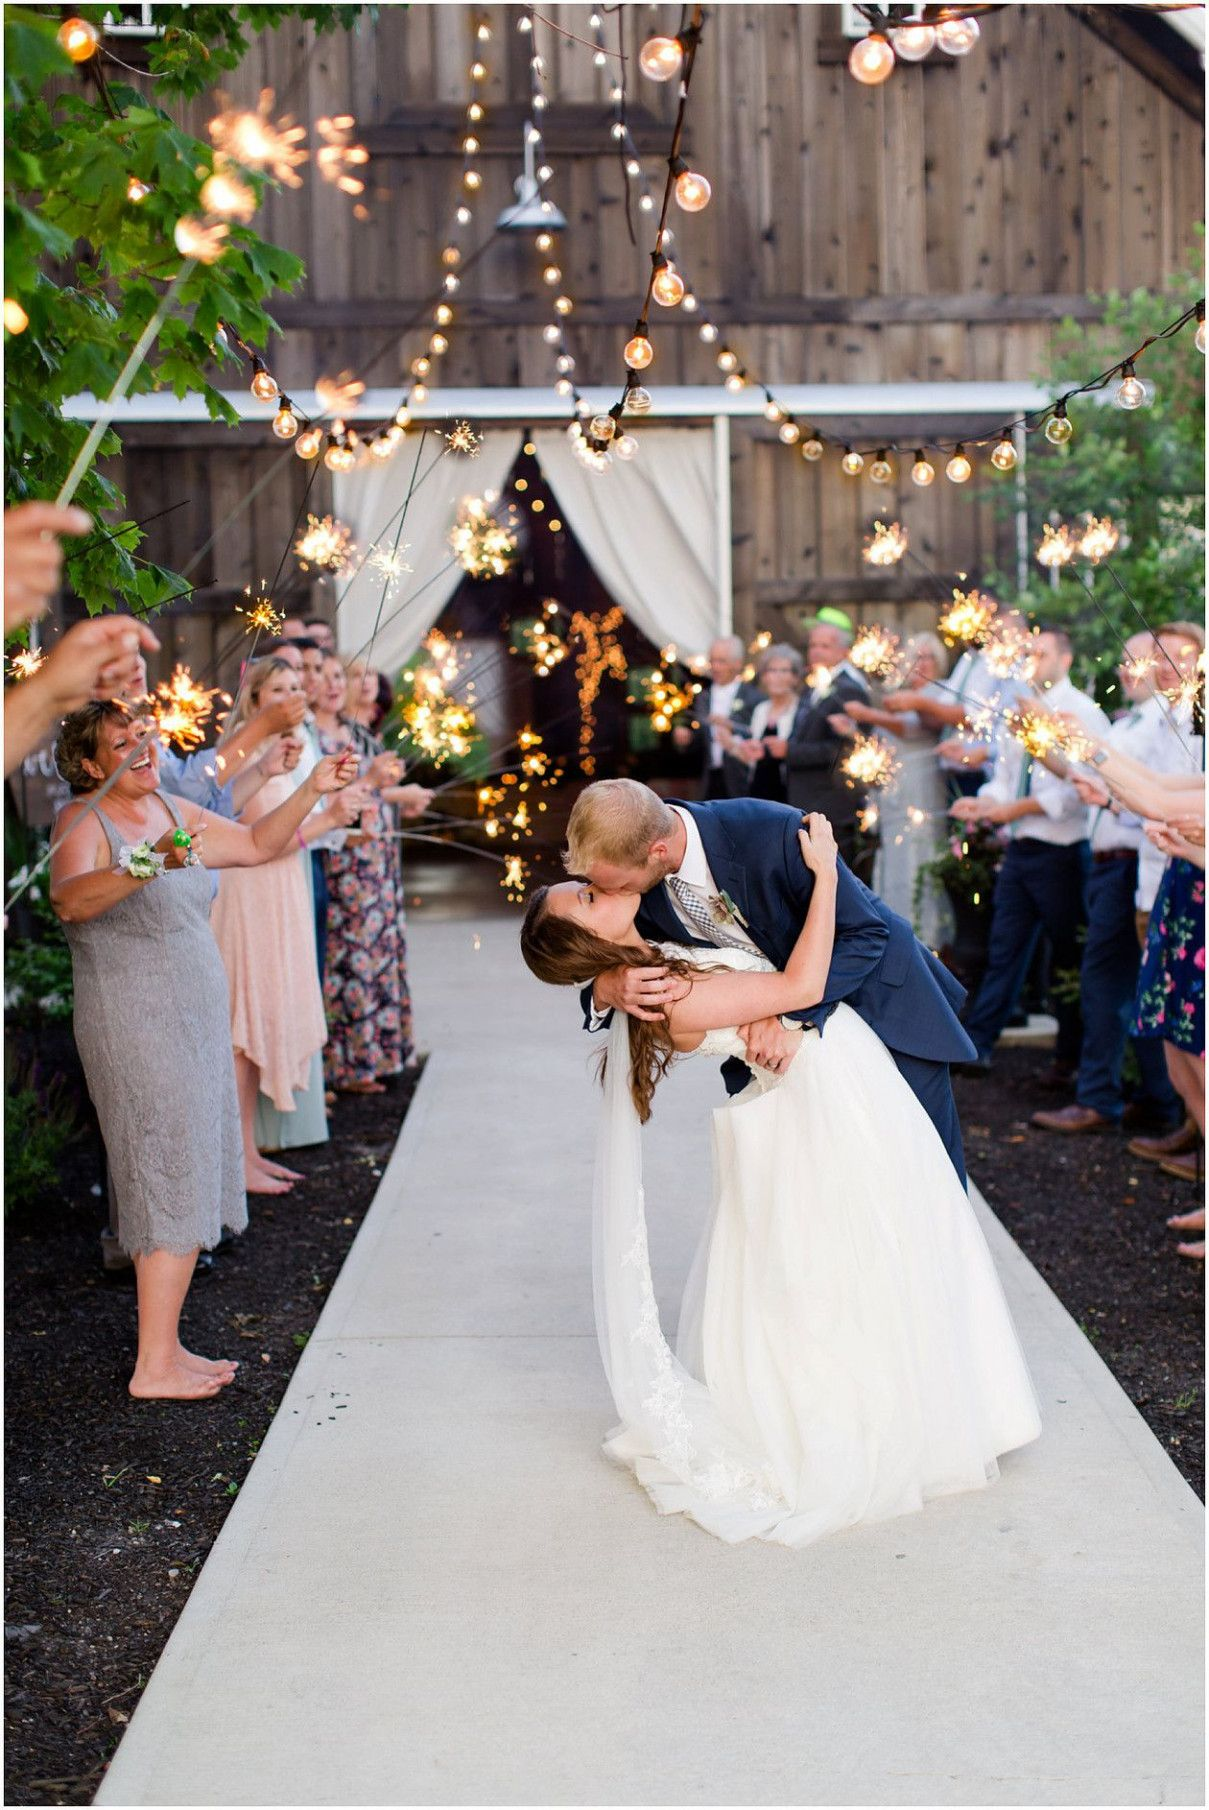 7 mindblowing reasons why barn wedding venues